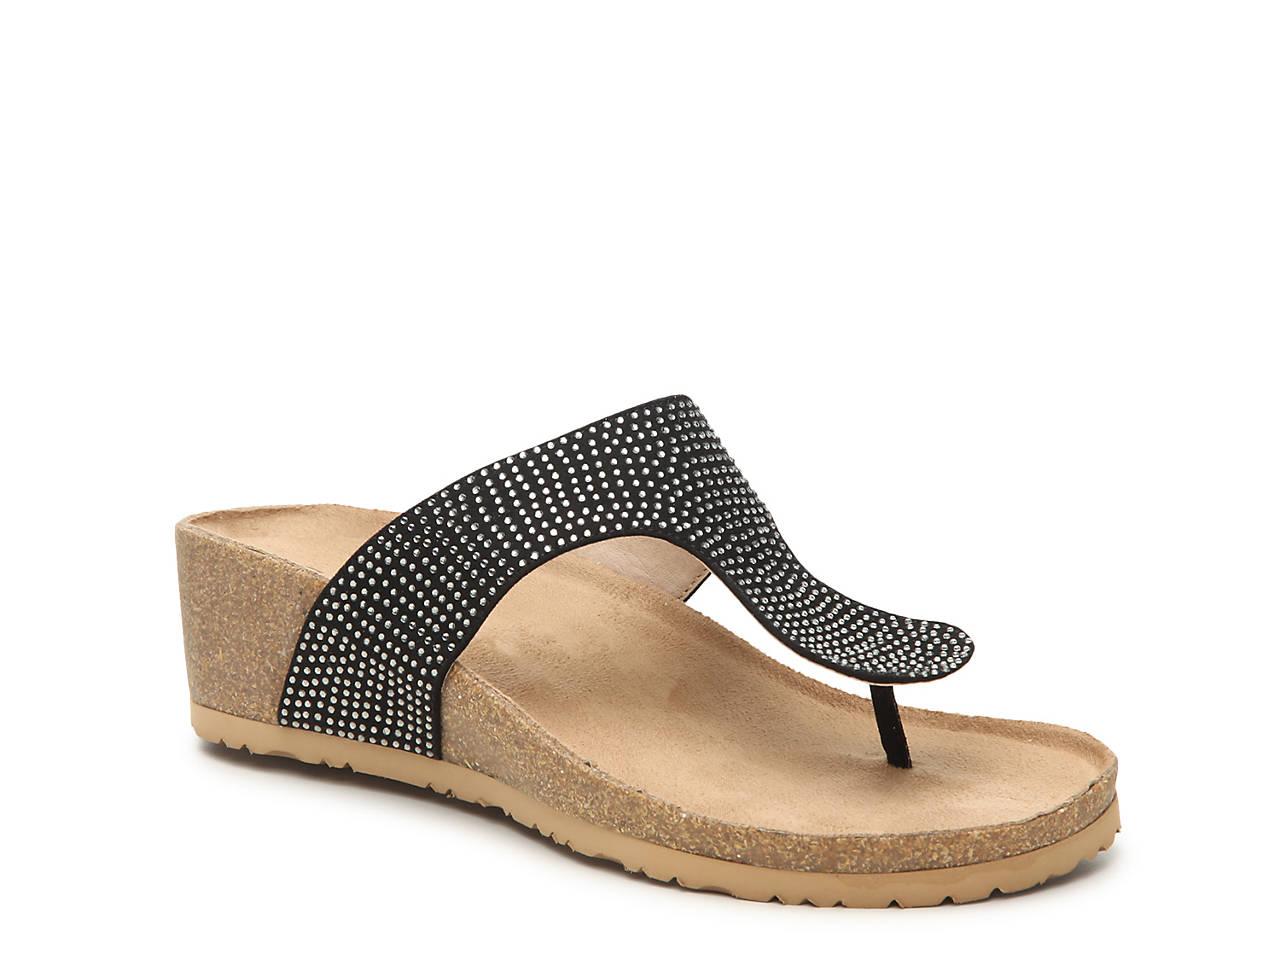 36d99c194c6a Zigi Soho Zarin Wedge Sandal Women s Shoes